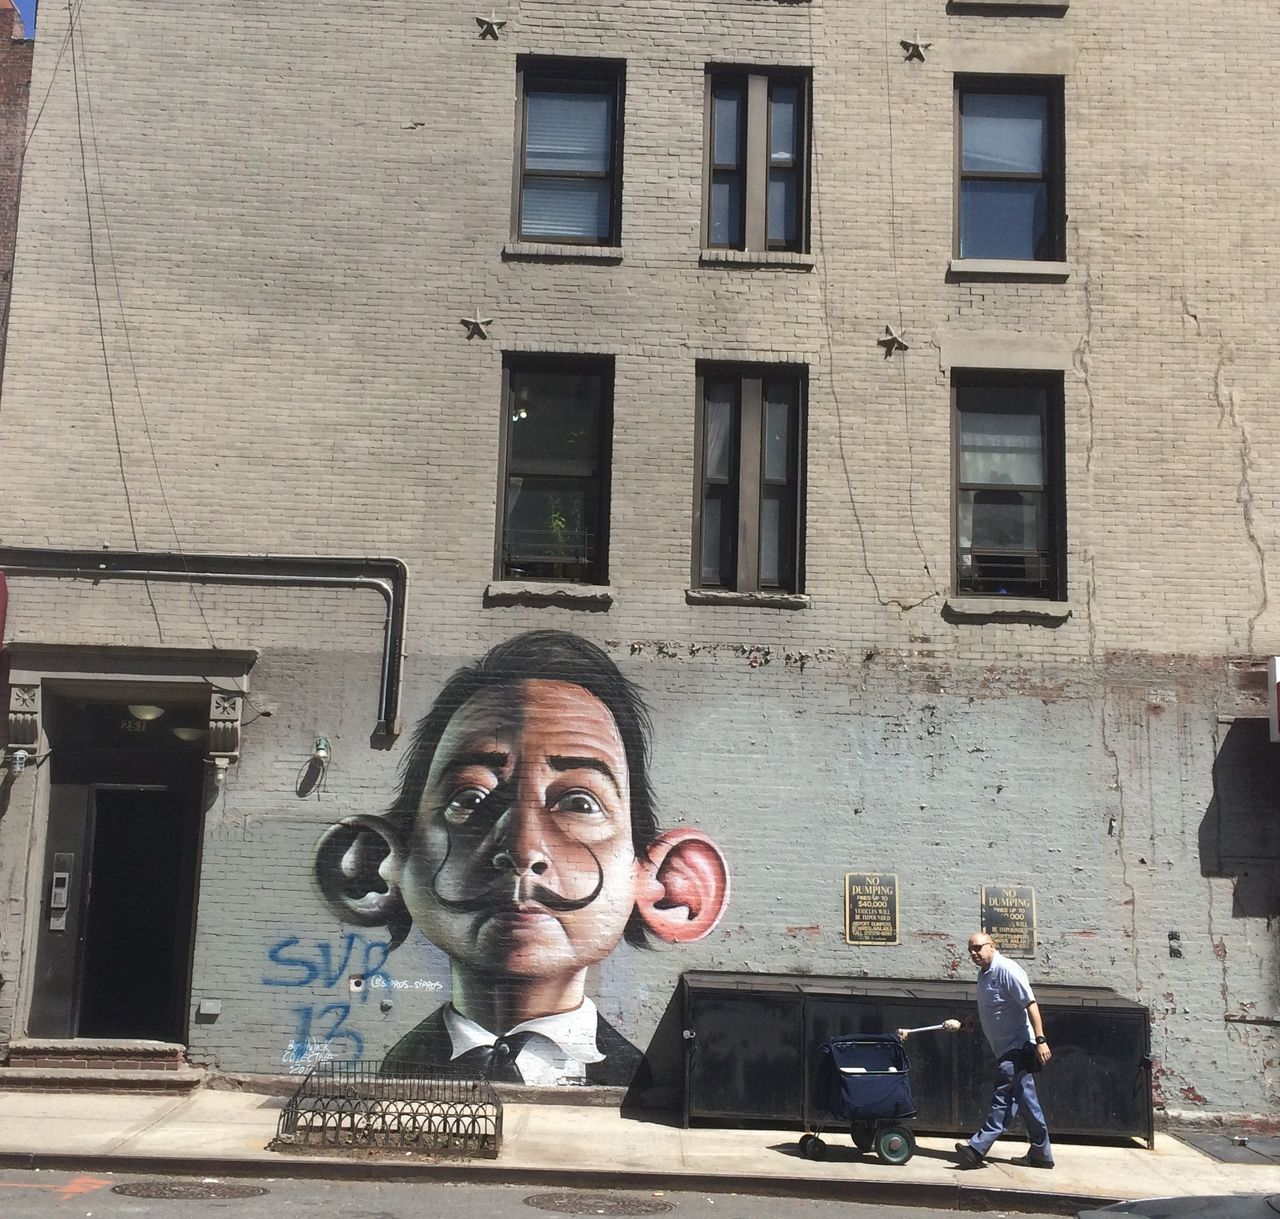 Salvador Dali Grafiti Grafiti Art Grafitti New York City New York City Photos NYC NYC Photography NYC Street Photography Salvador Dali Salvadordali Street Street Photography Streetphotography